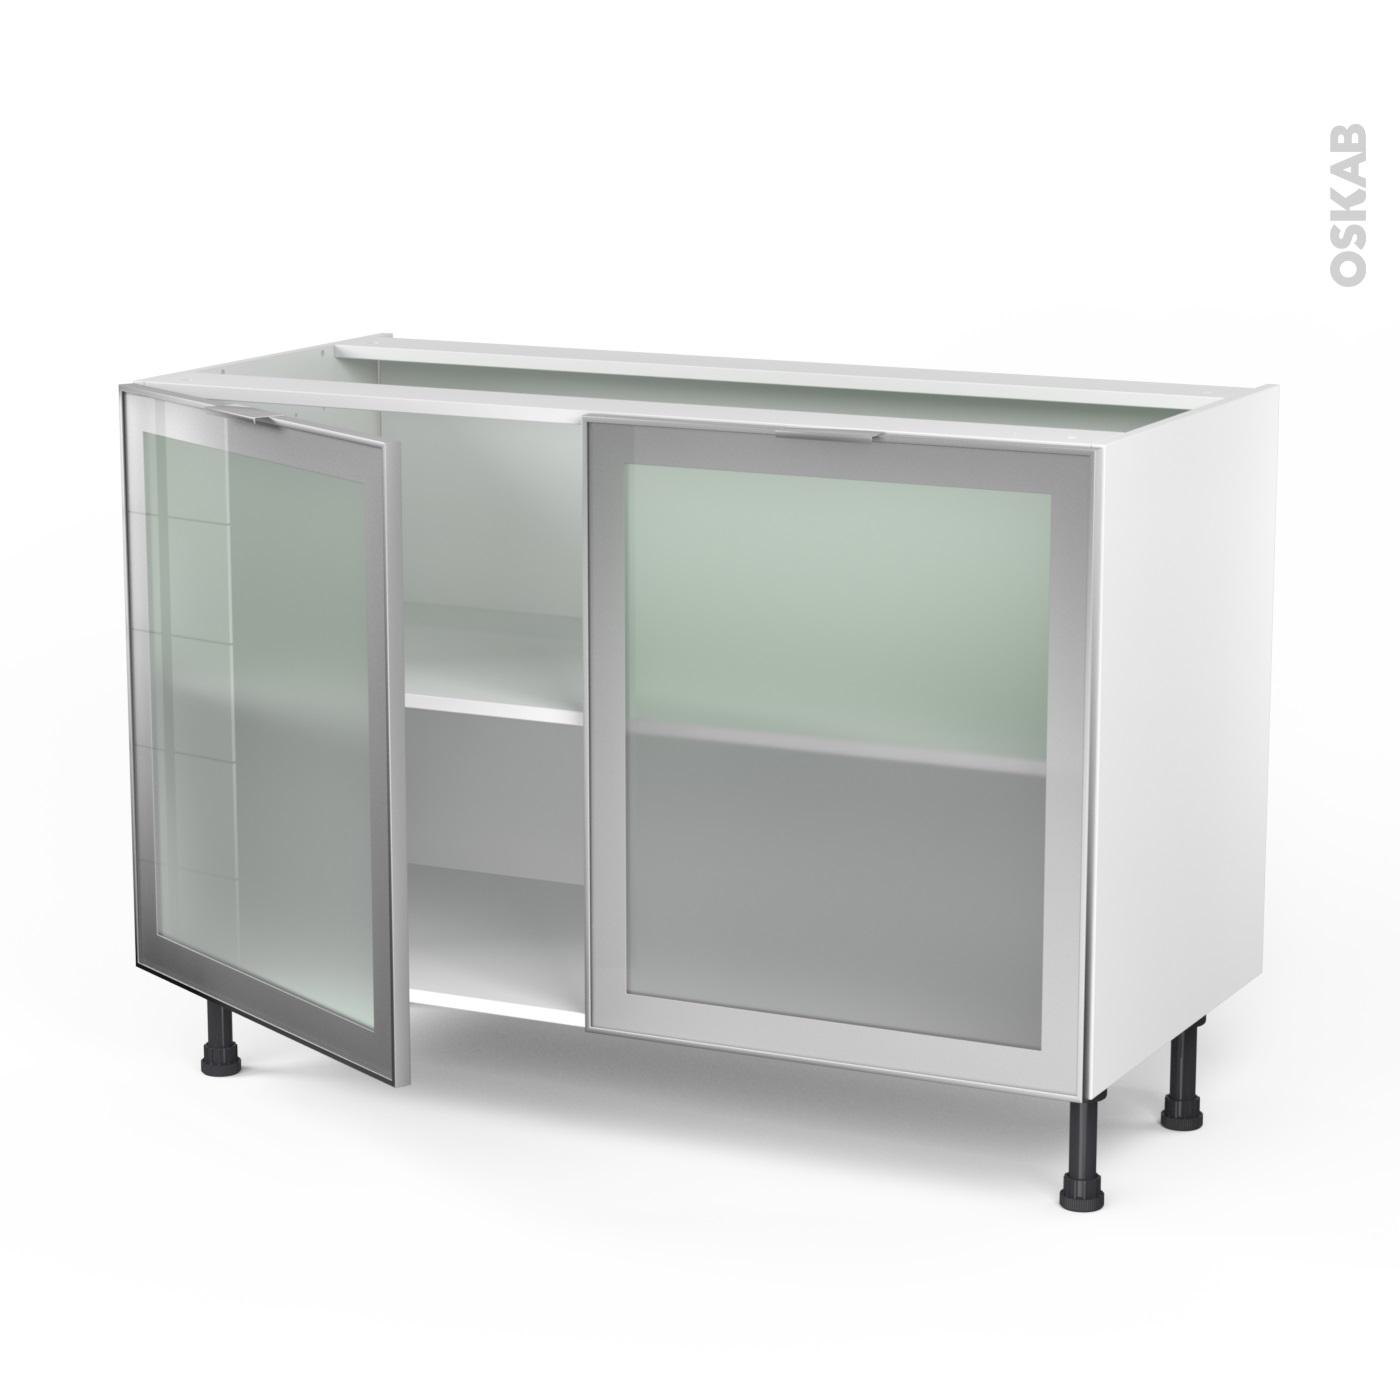 beautiful modele de placard pour cuisine en aluminium. Black Bedroom Furniture Sets. Home Design Ideas